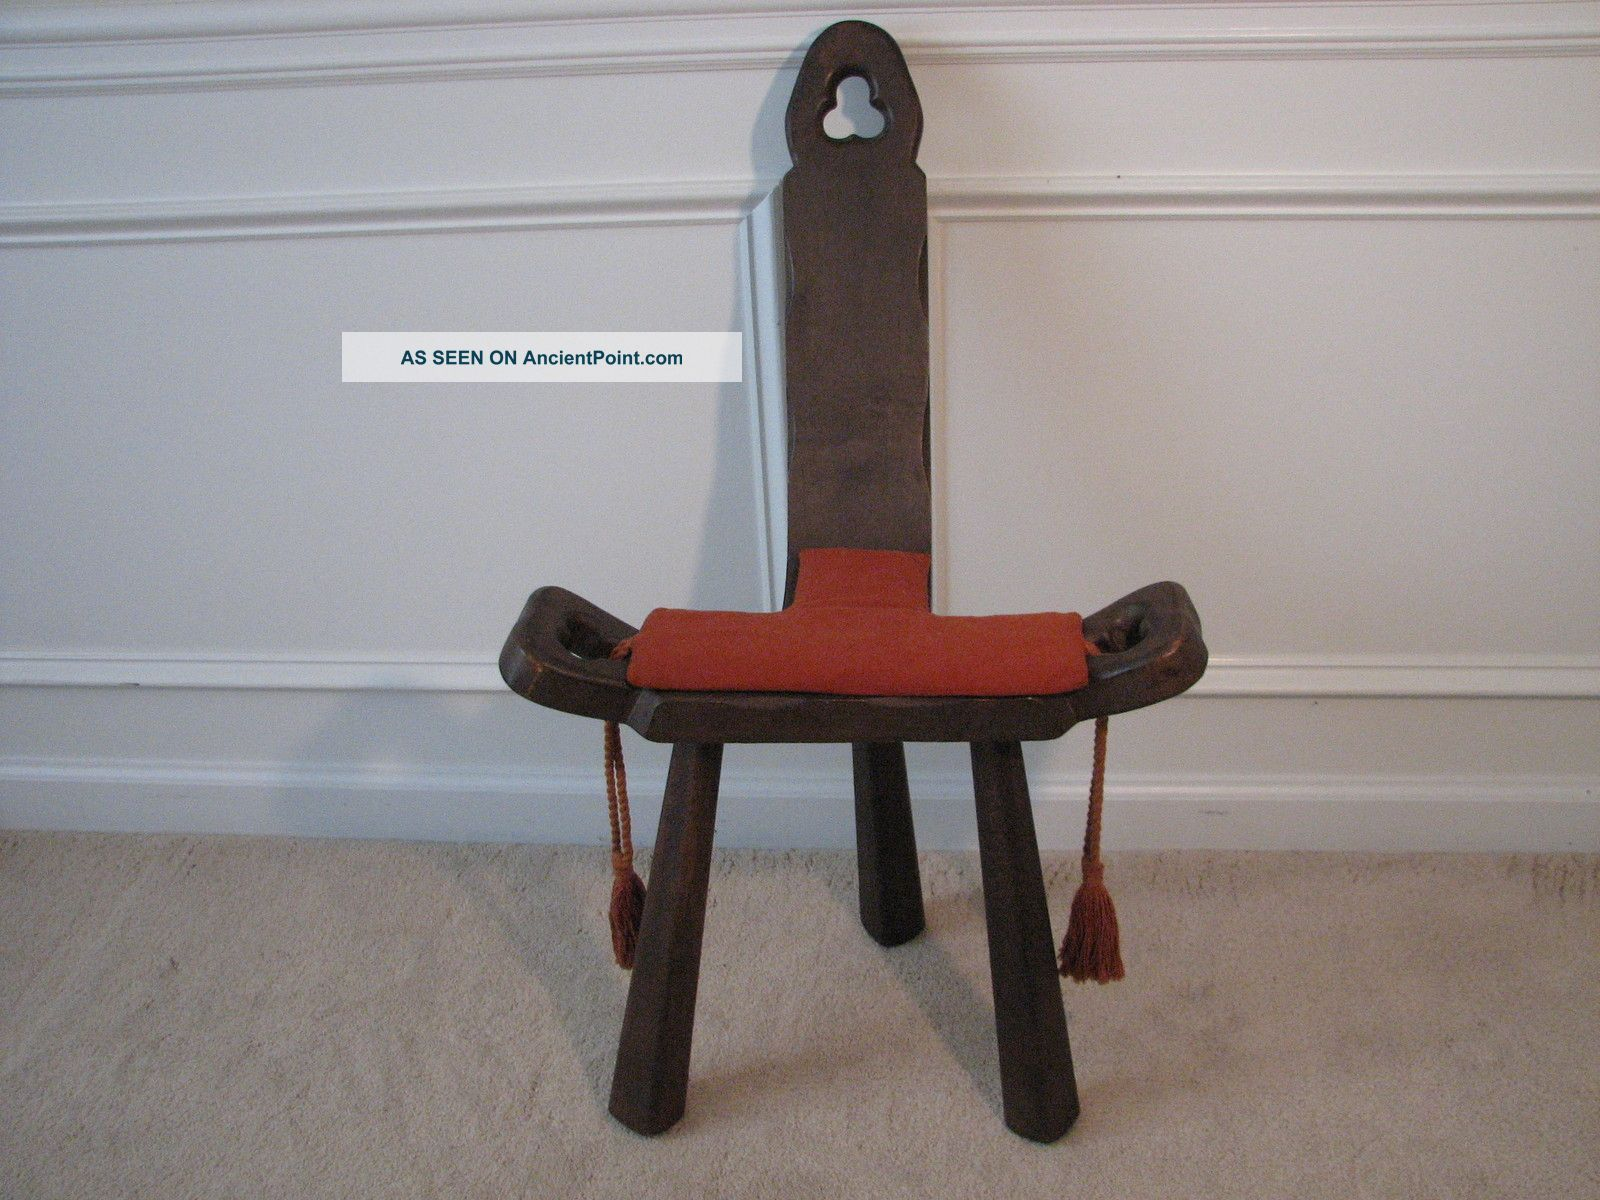 Antique birthing chair - Antique Vintage Geman Hand Carved Wooden Labor Birthing Chair 1900 1950 Photo